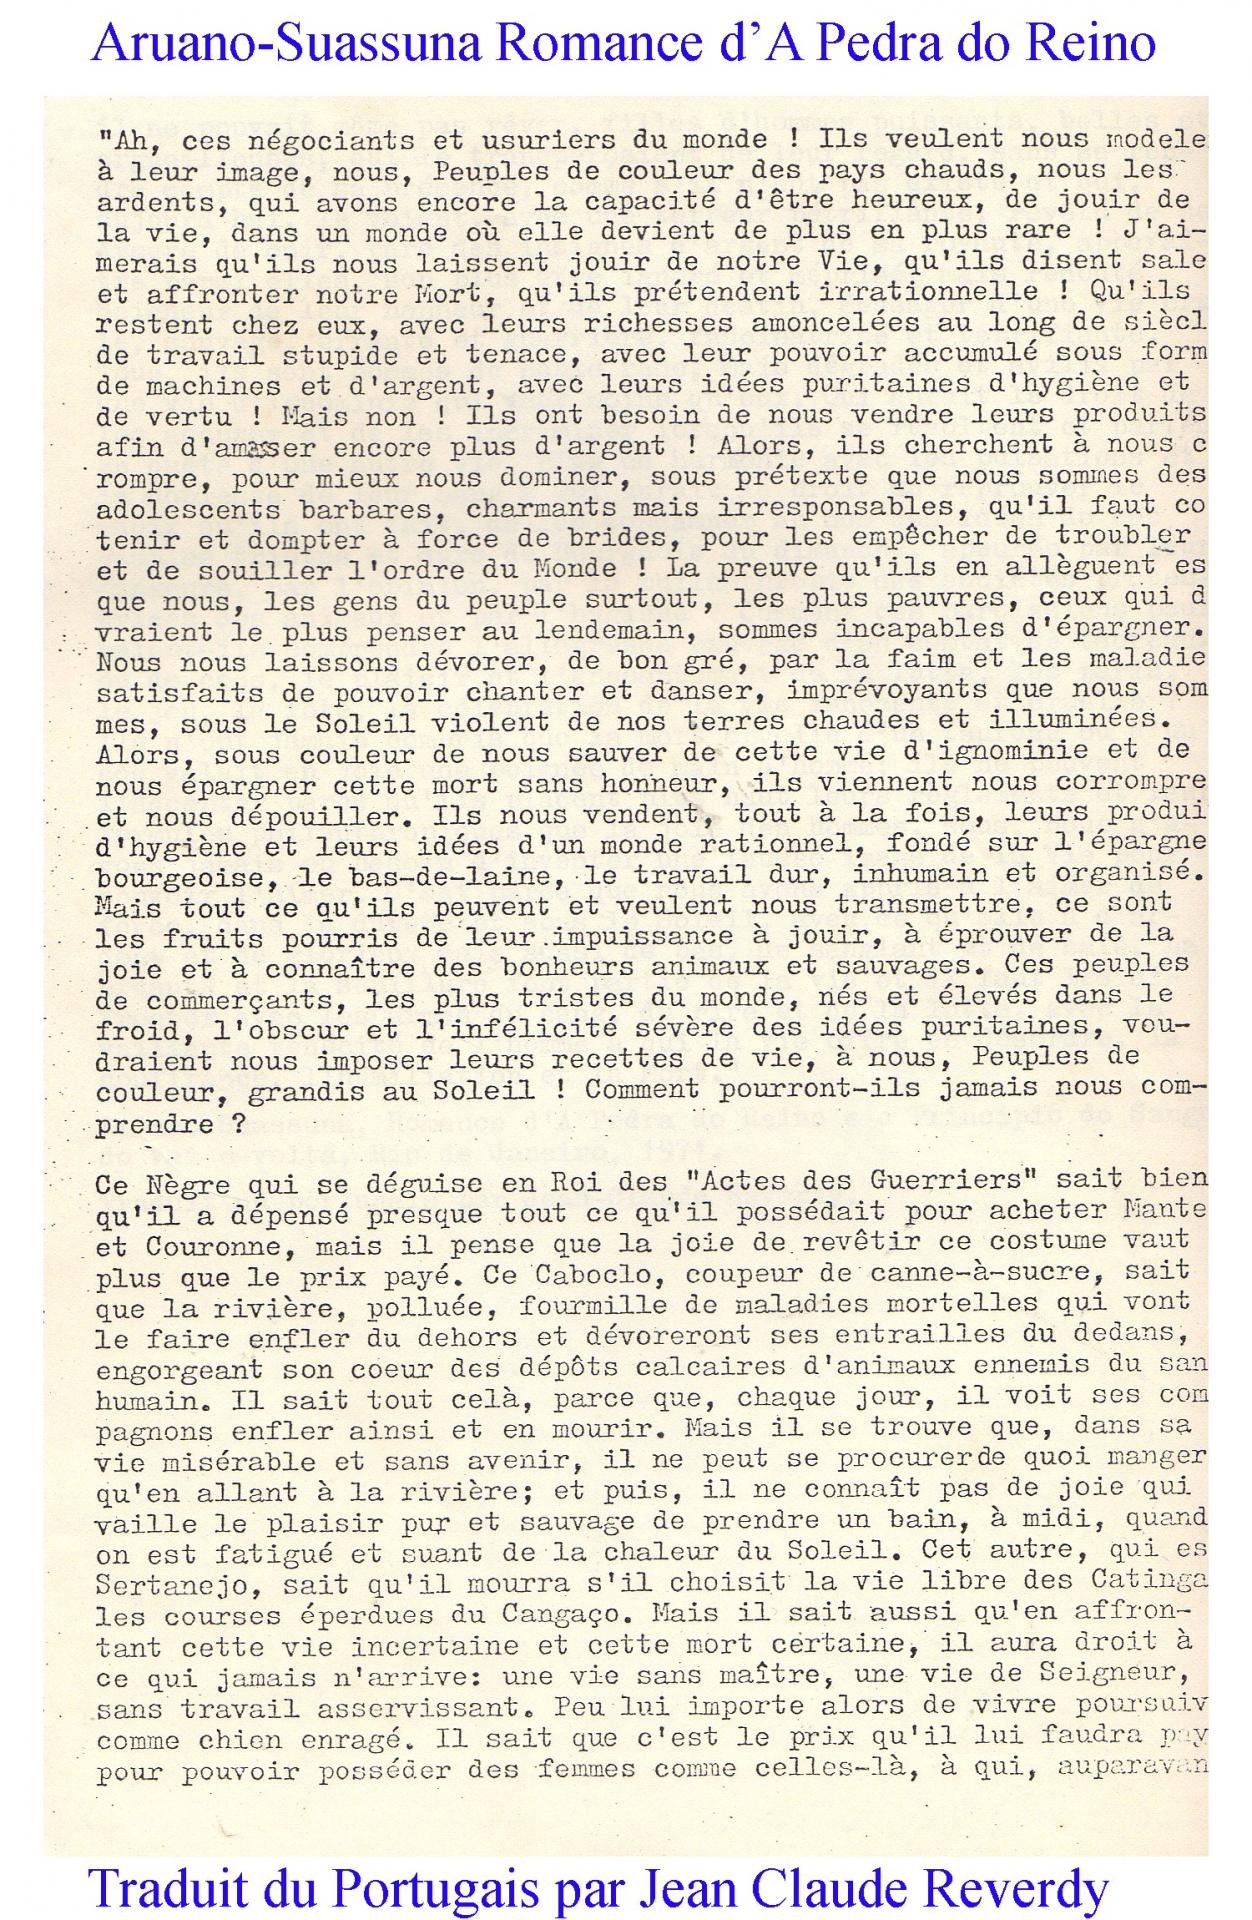 1980 reverdy page 1 adobe